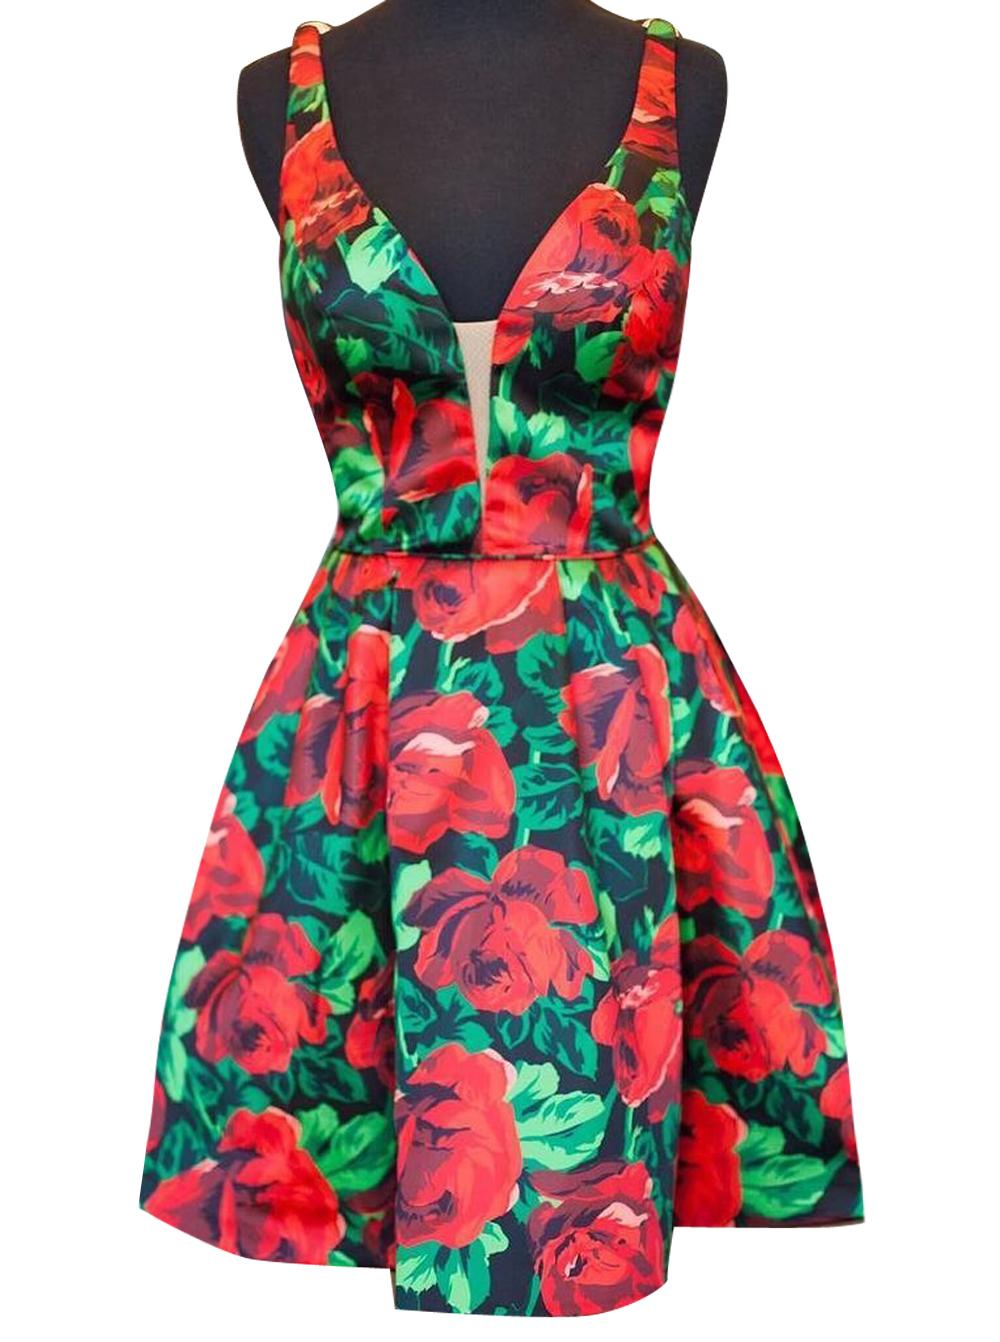 Simple-dress / A-line Deep V-neck Short Satin Sleeveless Flowers Print Backless Homecoming Dress